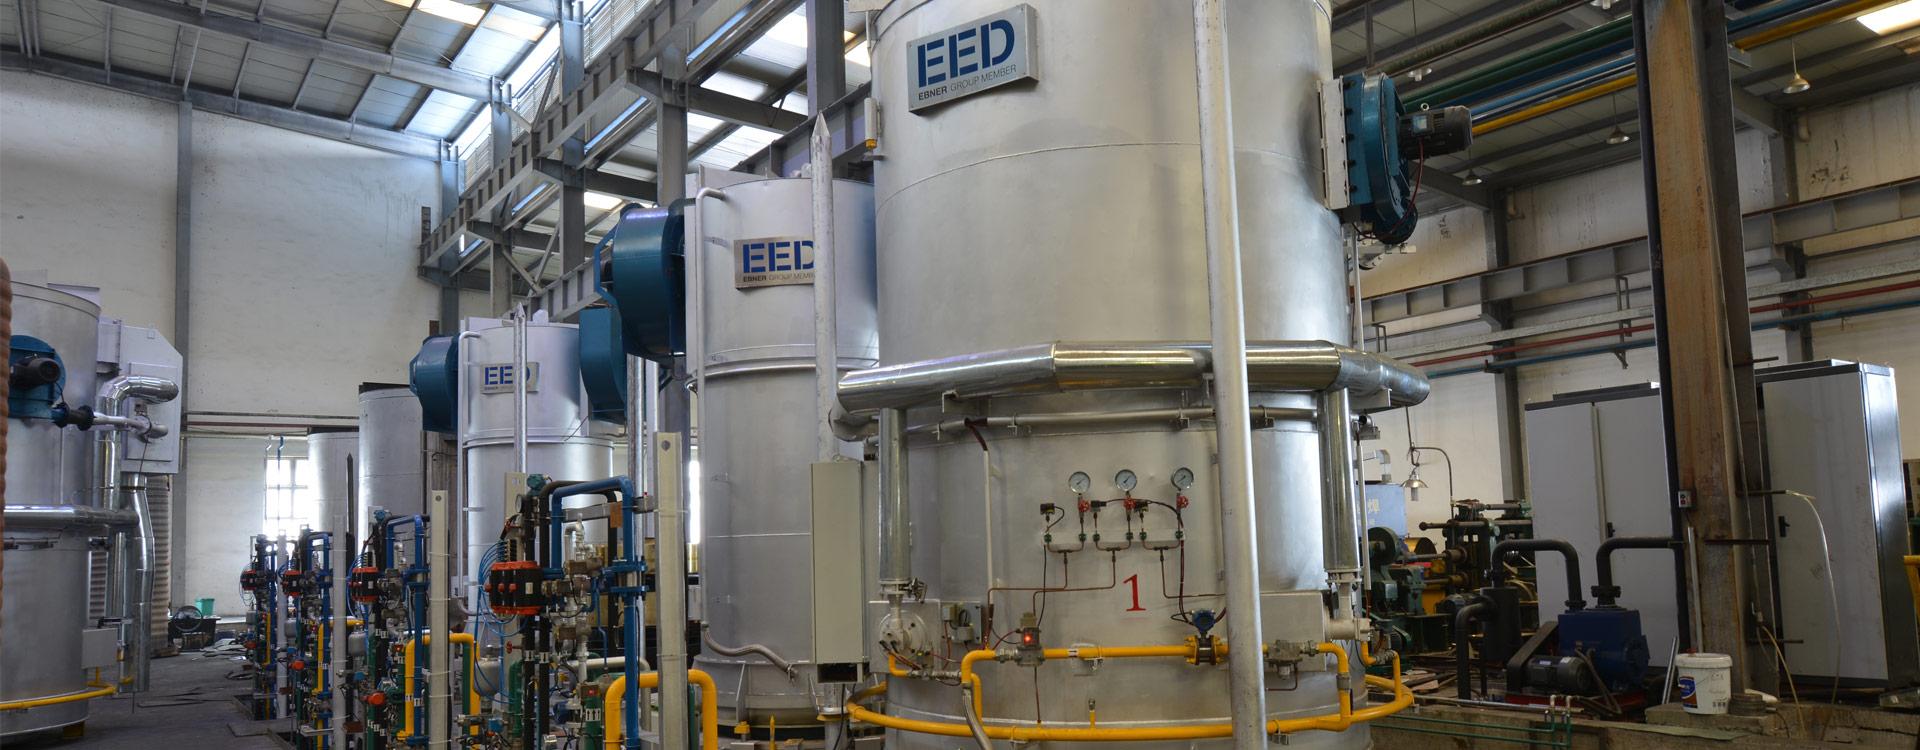 EED - EBNER Group